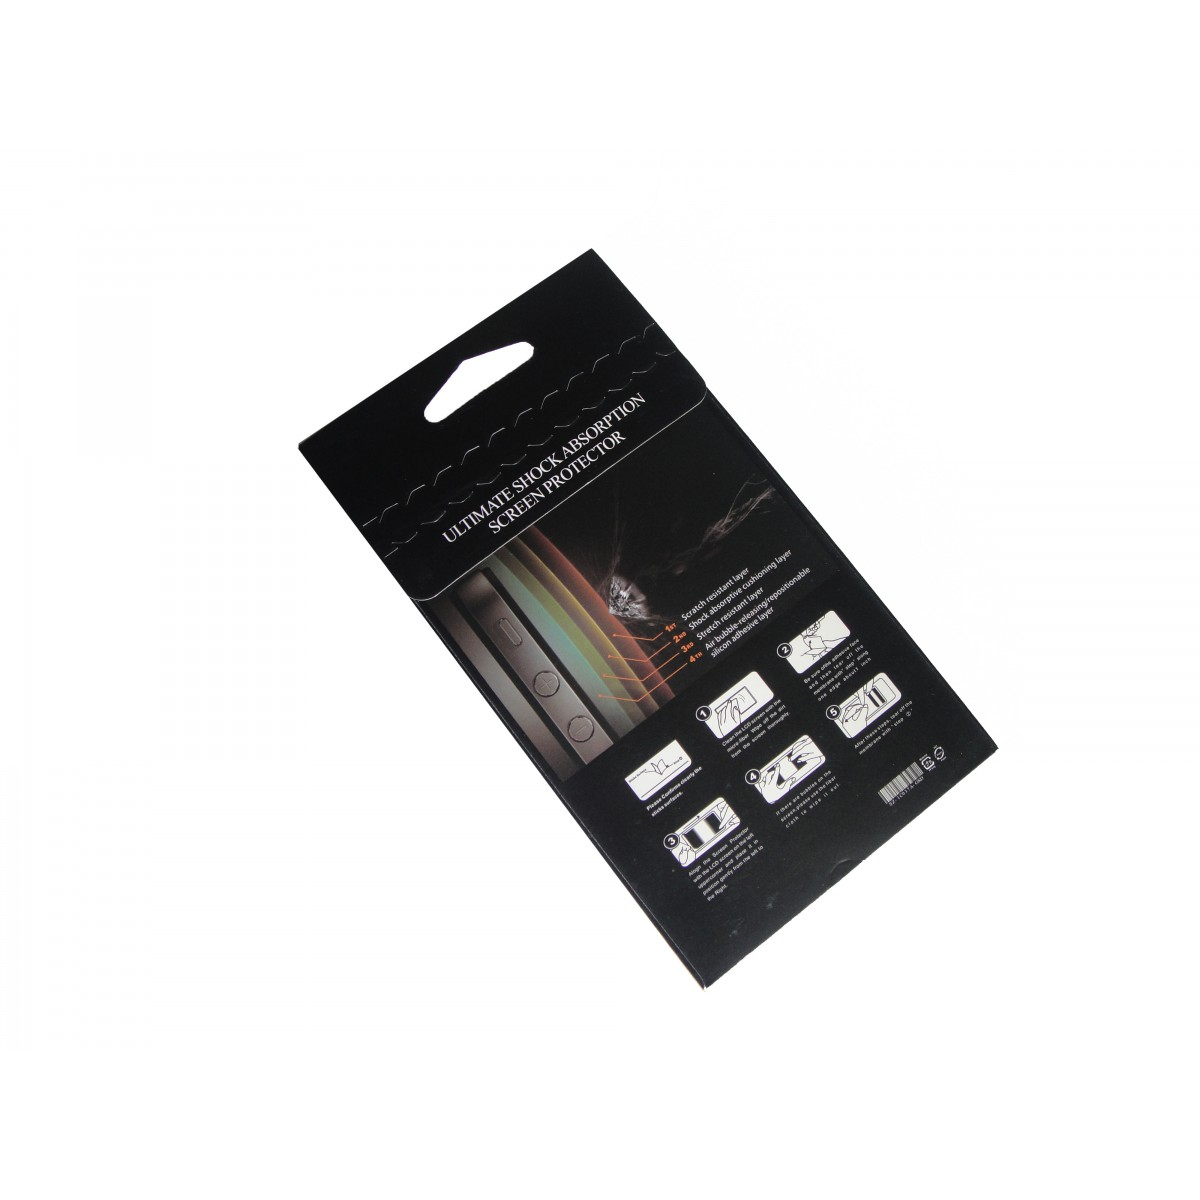 Pelicula Samsung Galaxy Win i8550 i8552 Anti Impacto